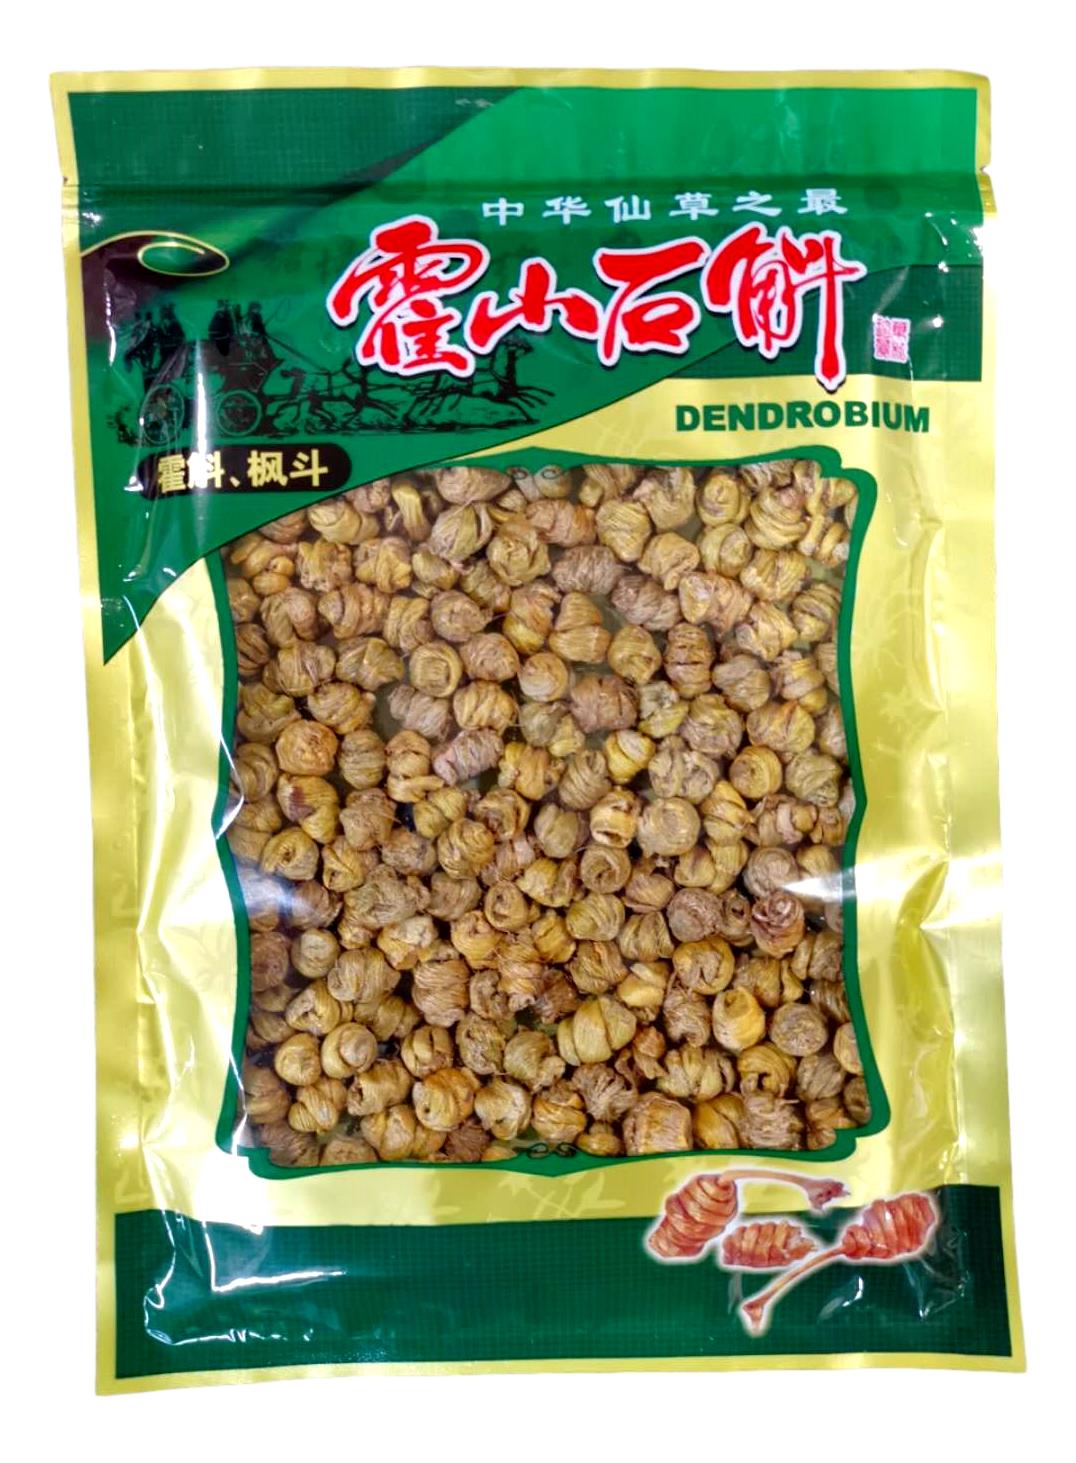 Dried Dendrobium Stem / Shihu 8oz 优质霍山石斛/霍斛/枫斗 8oz